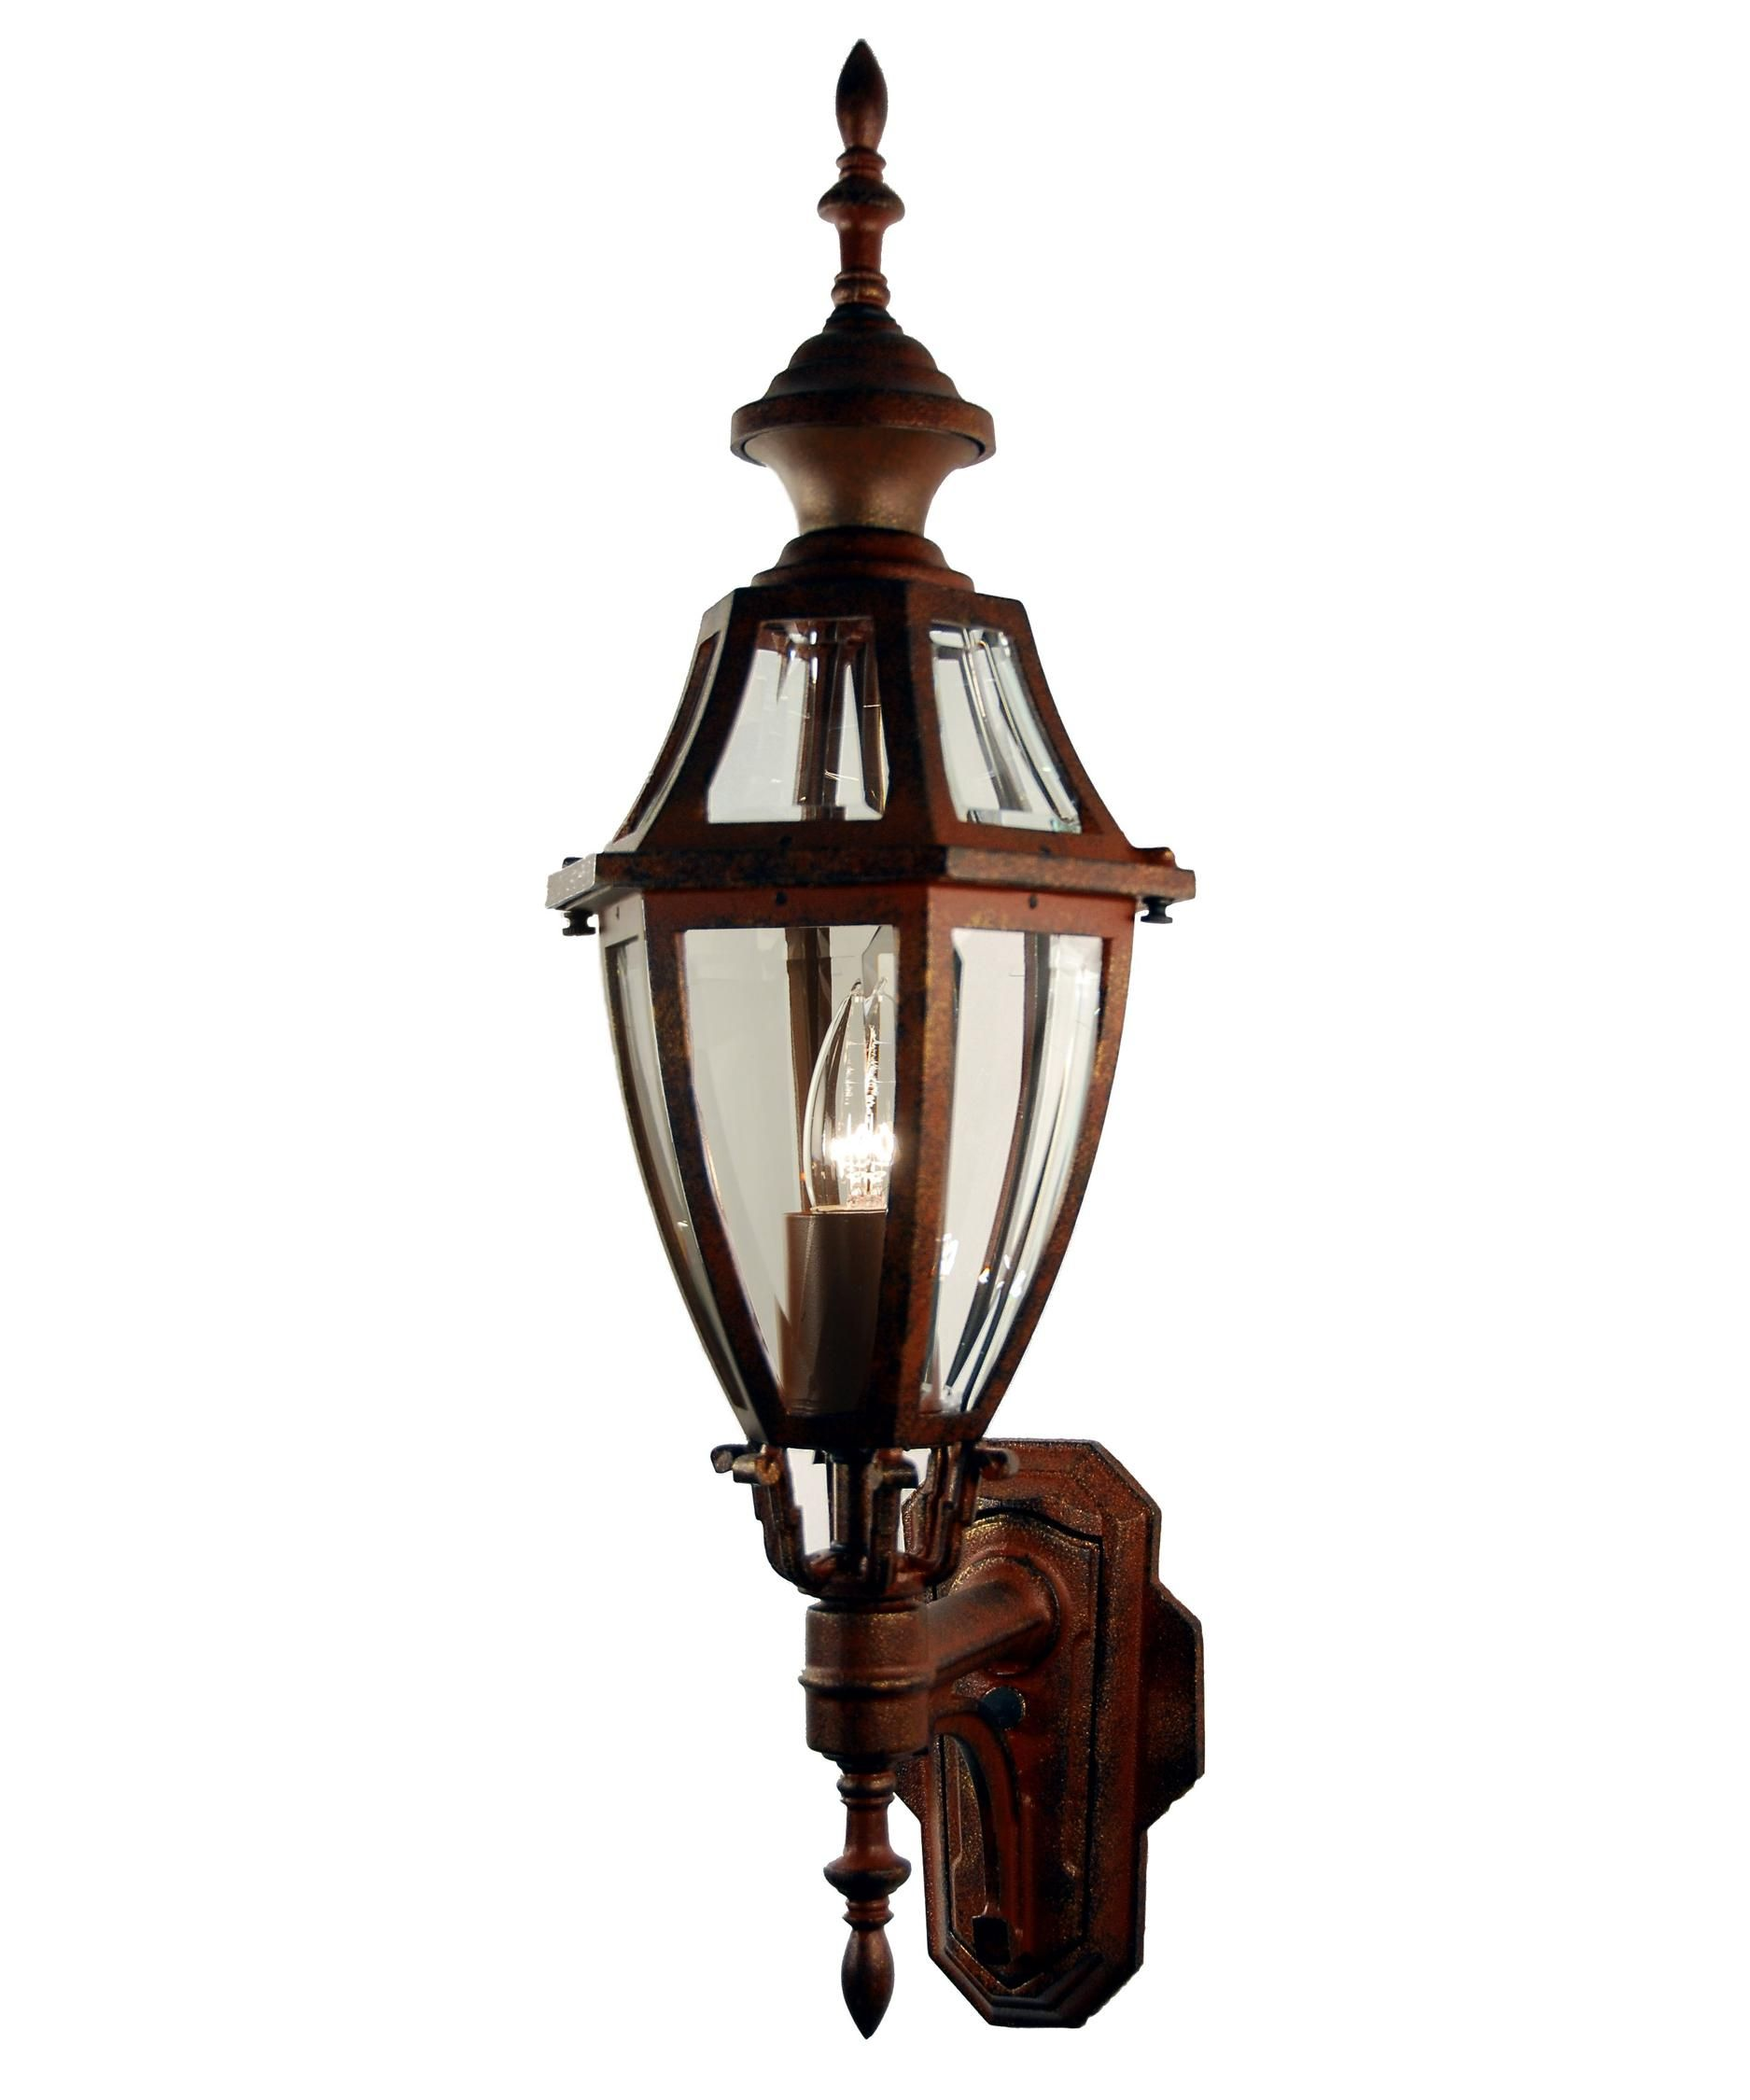 Hanover Outdoor Lighting Hanover lantern b13210wbzjd augusta small outdoor wall light hanover lantern b13210wbzjd augusta small outdoor wall light capitol lighting 1800lighting workwithnaturefo